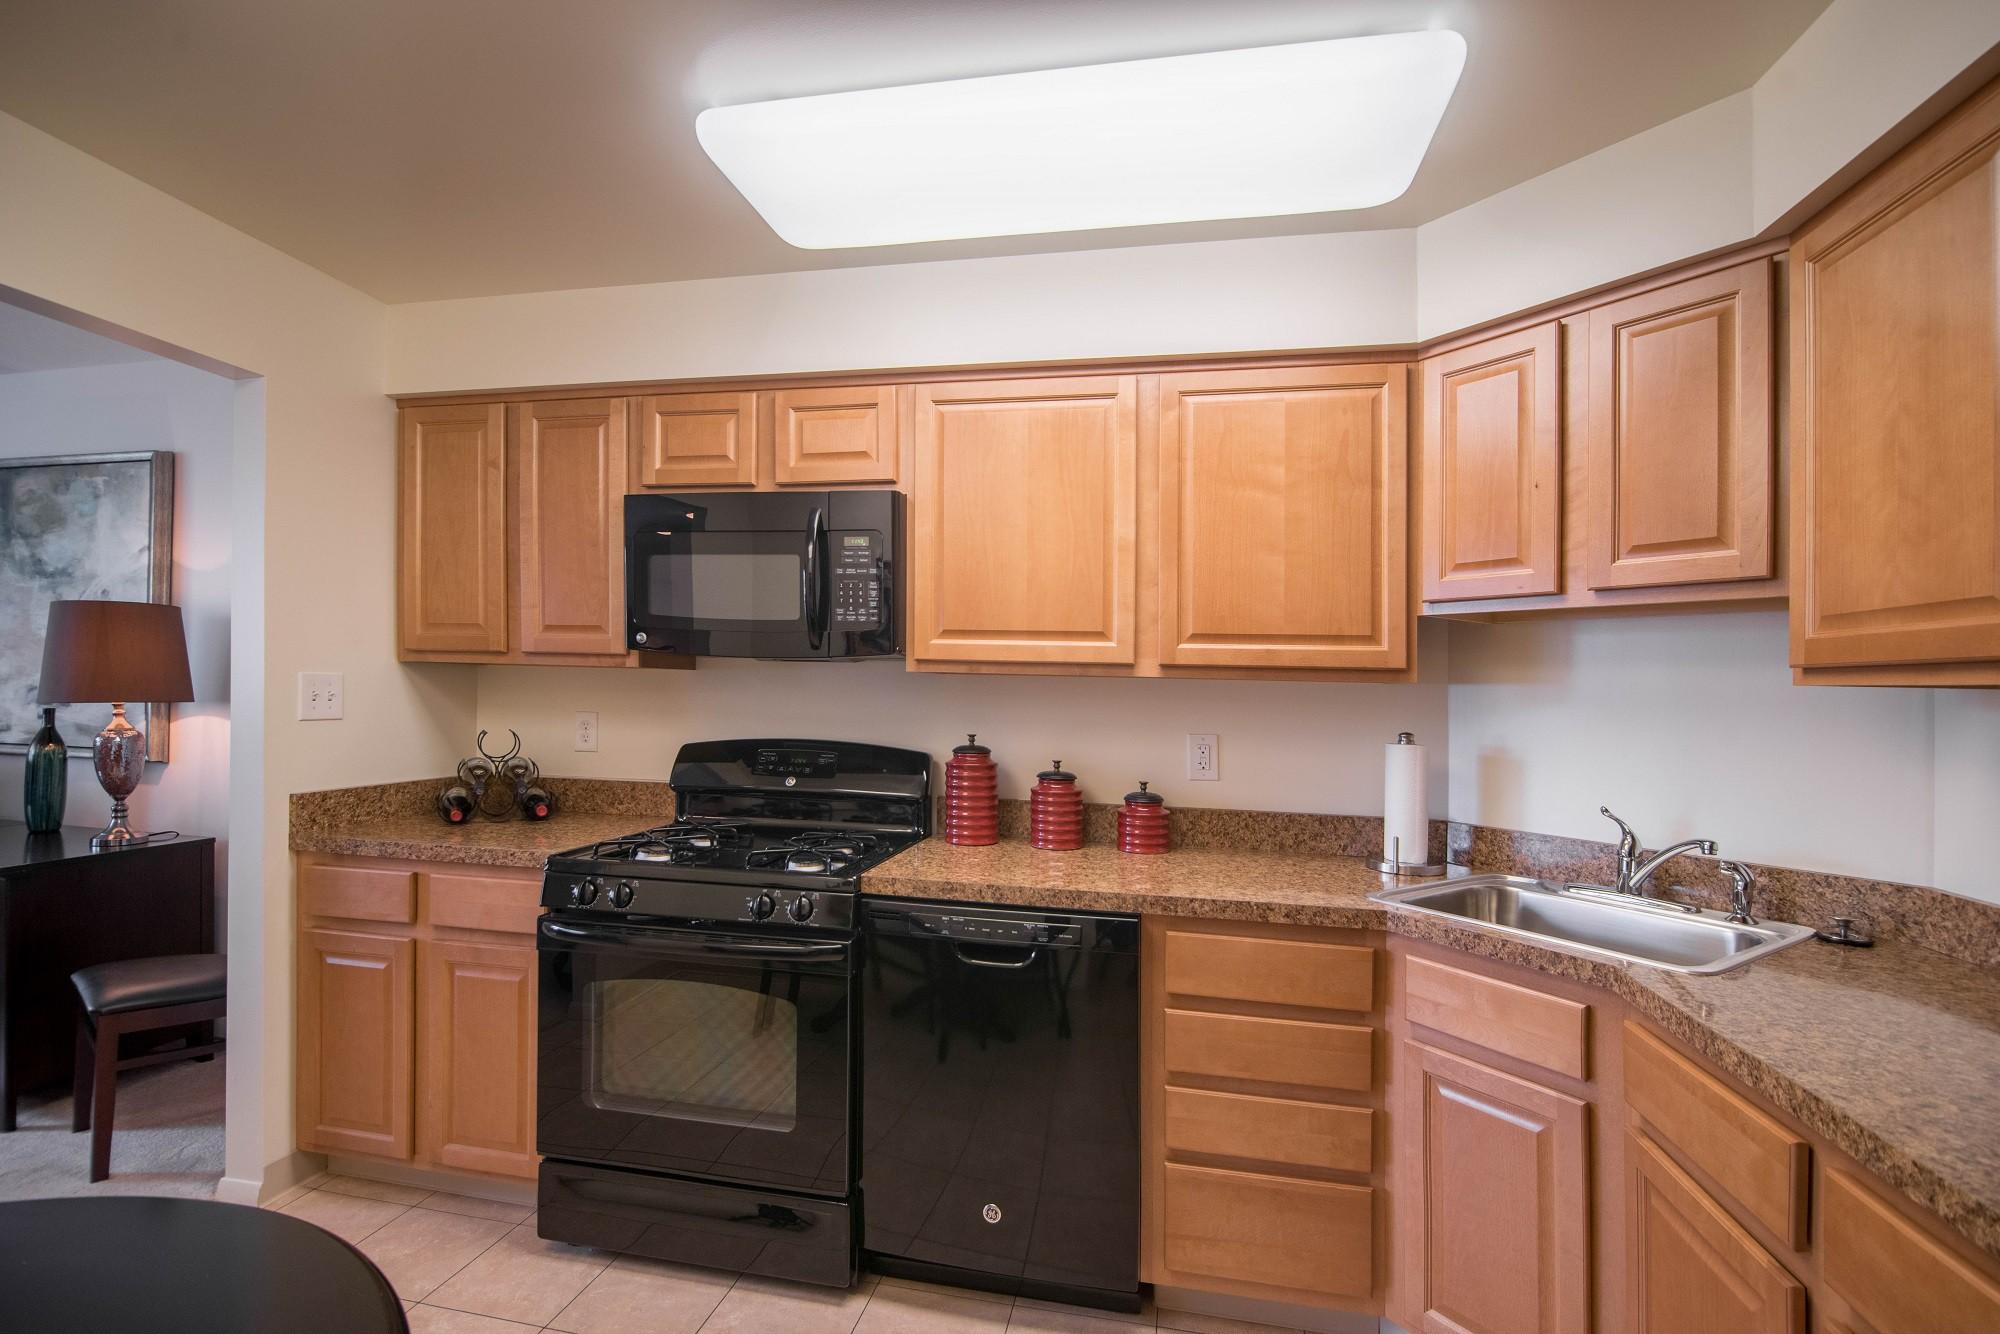 Apartments Near Independence Sherri Park Apartments for Independence Students in Independence, OH